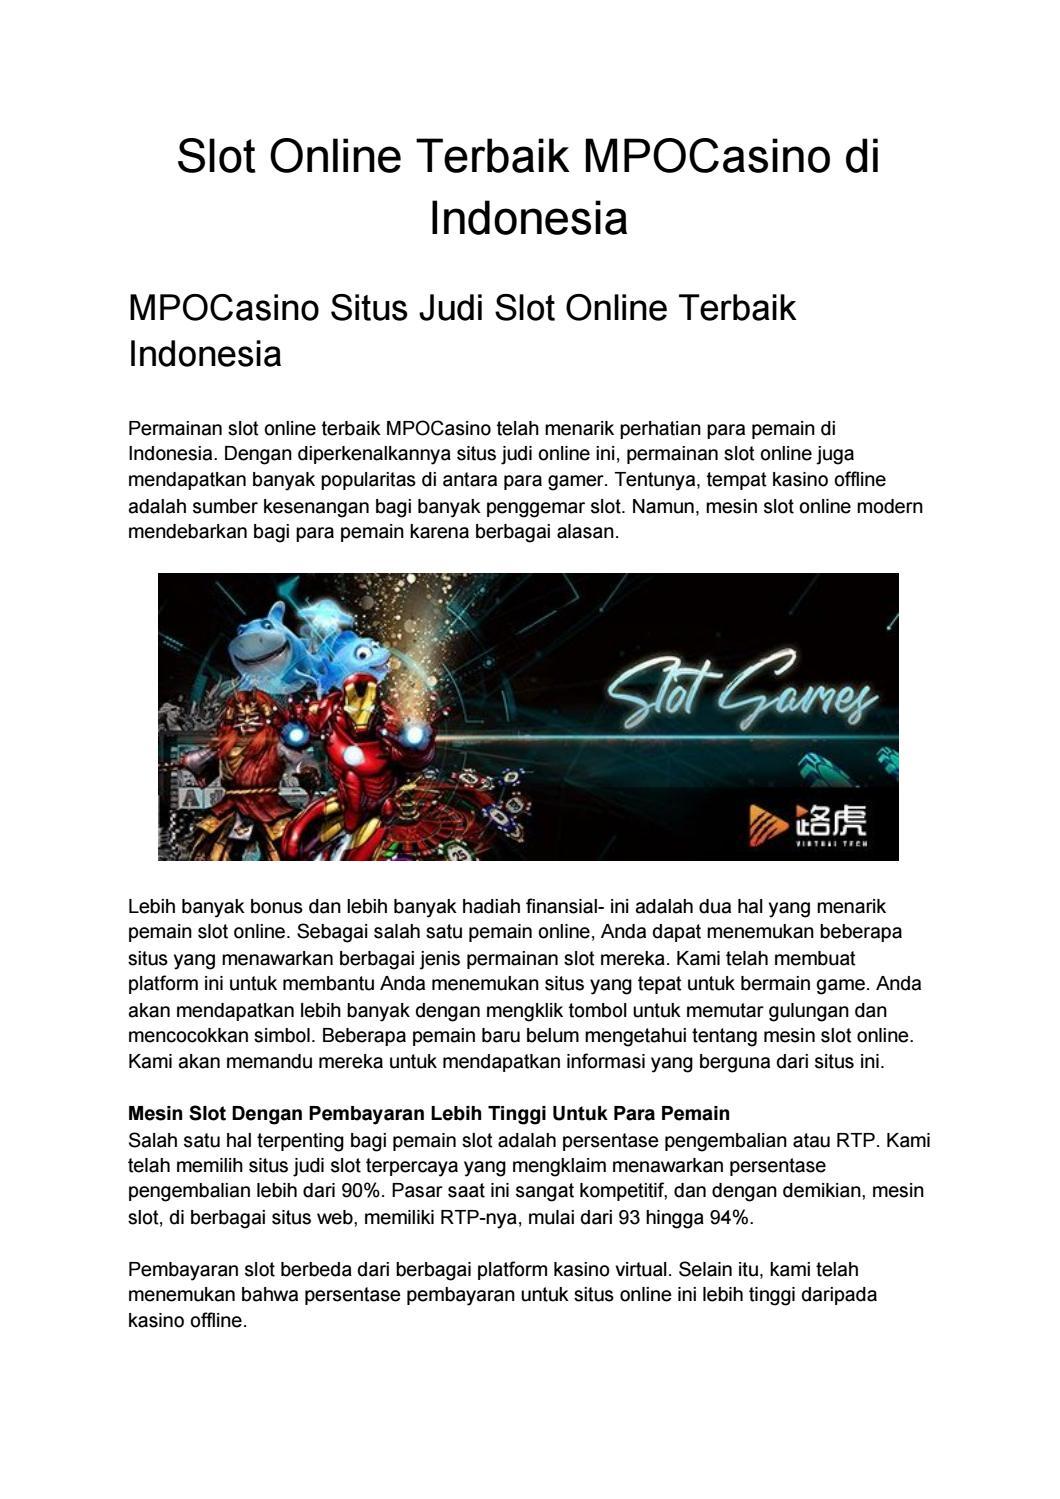 Slot Onnline Terbaik Mpocasino Di Indonesia By Mpocasino Issuu